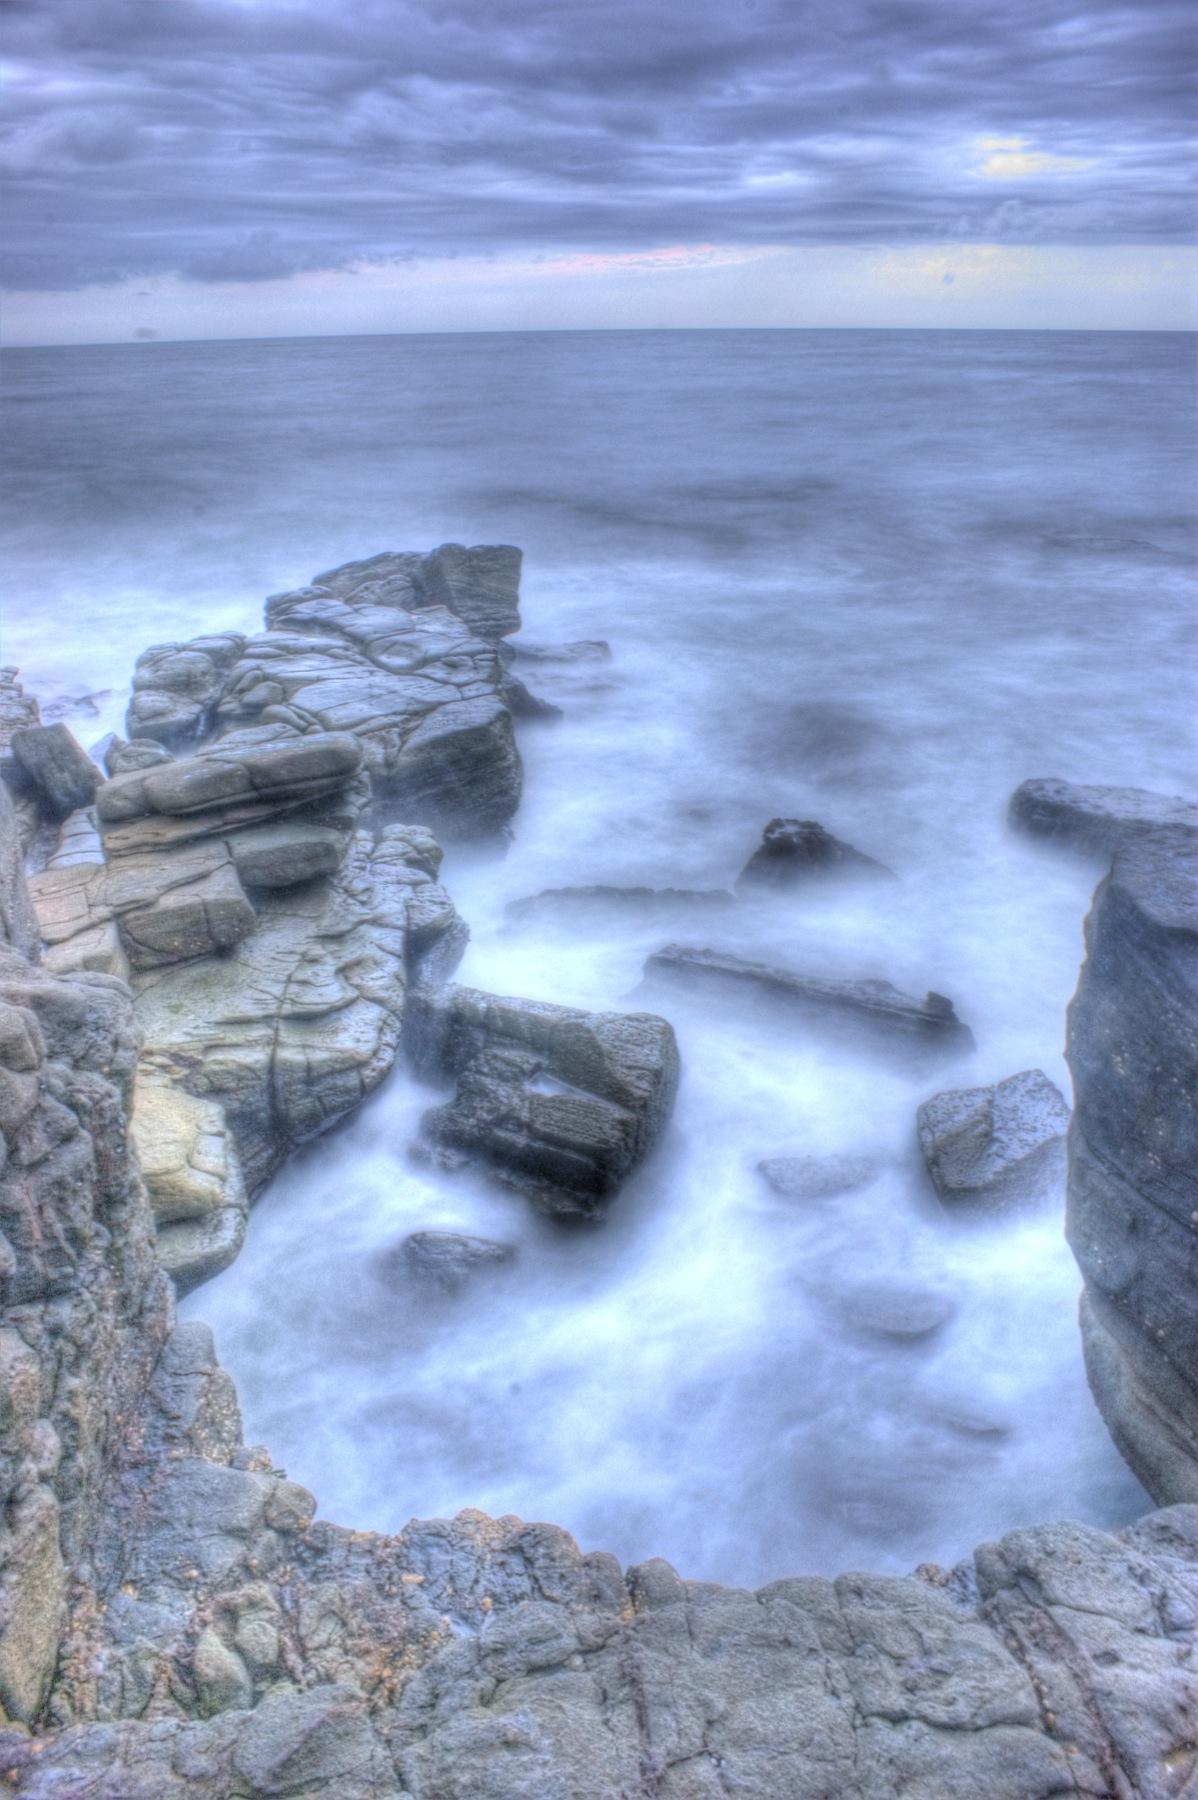 https://www.images.scottphotographics.com/shot-of-the-day/%234/On-the-rocks-Mooloolaba01.jpg